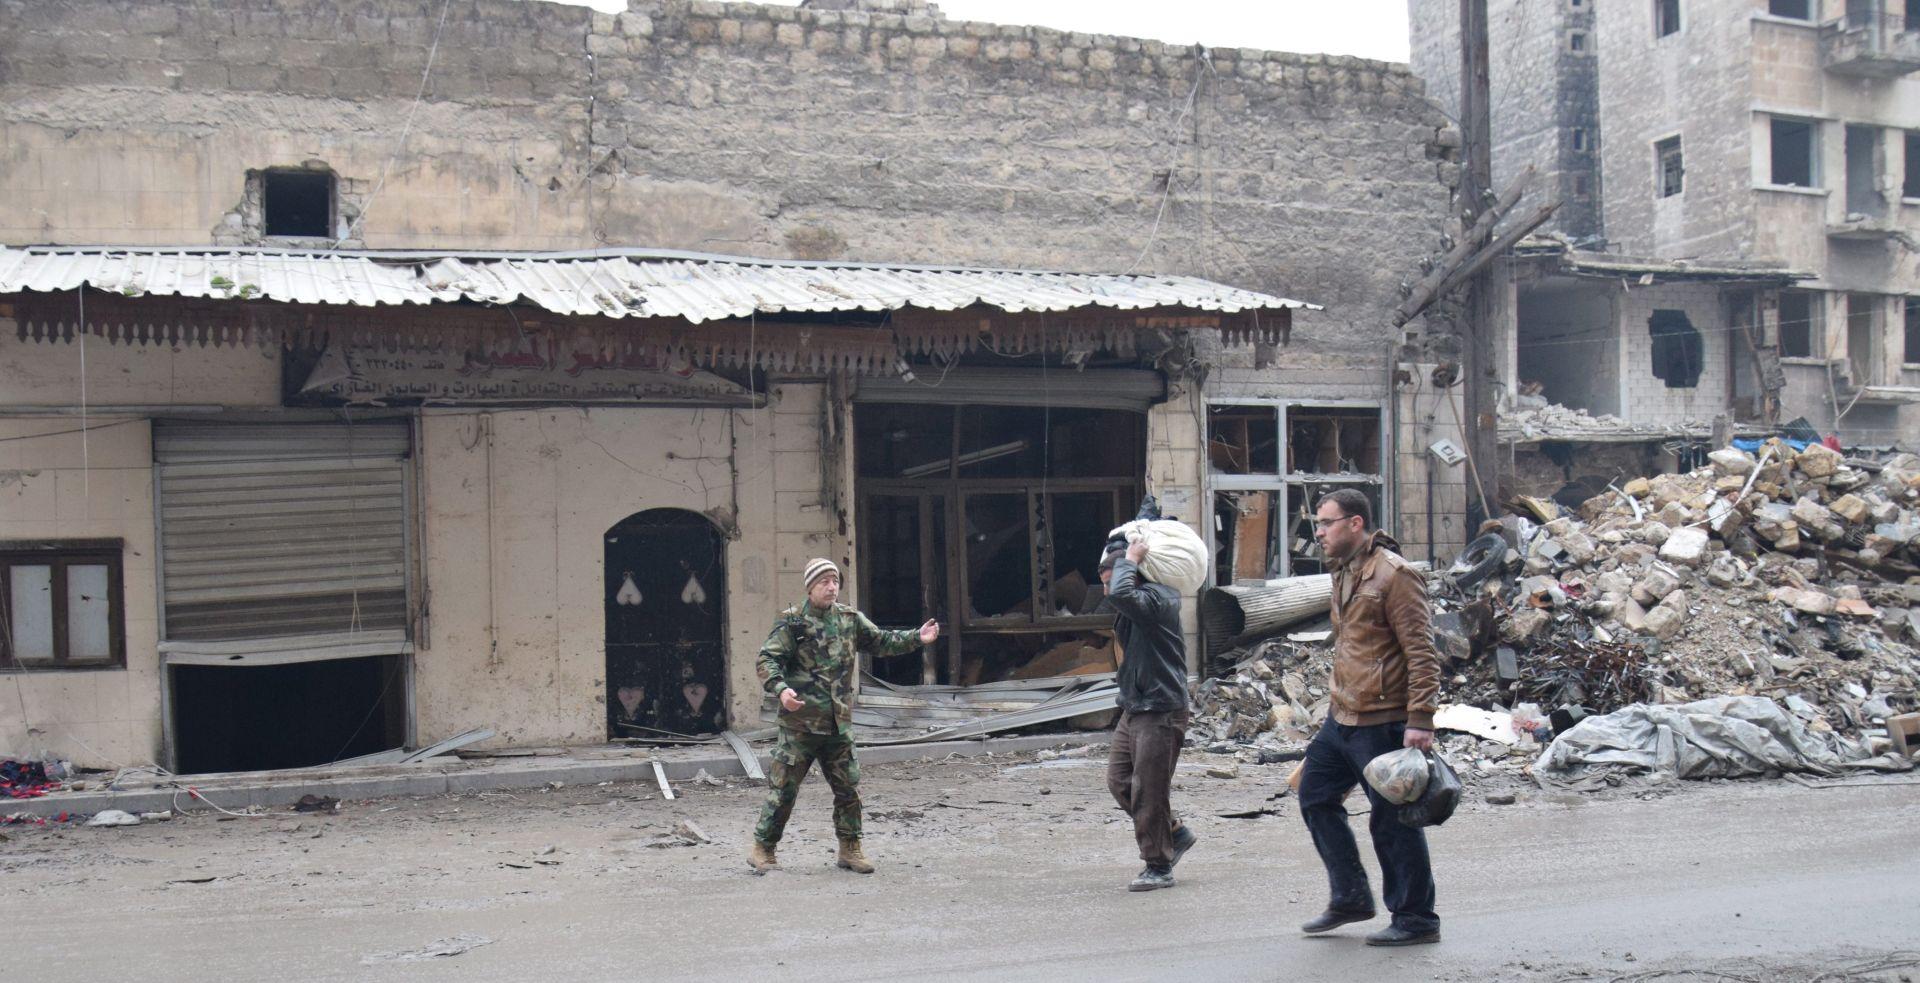 Američka vojska u Siriji bombardira al Qaedu